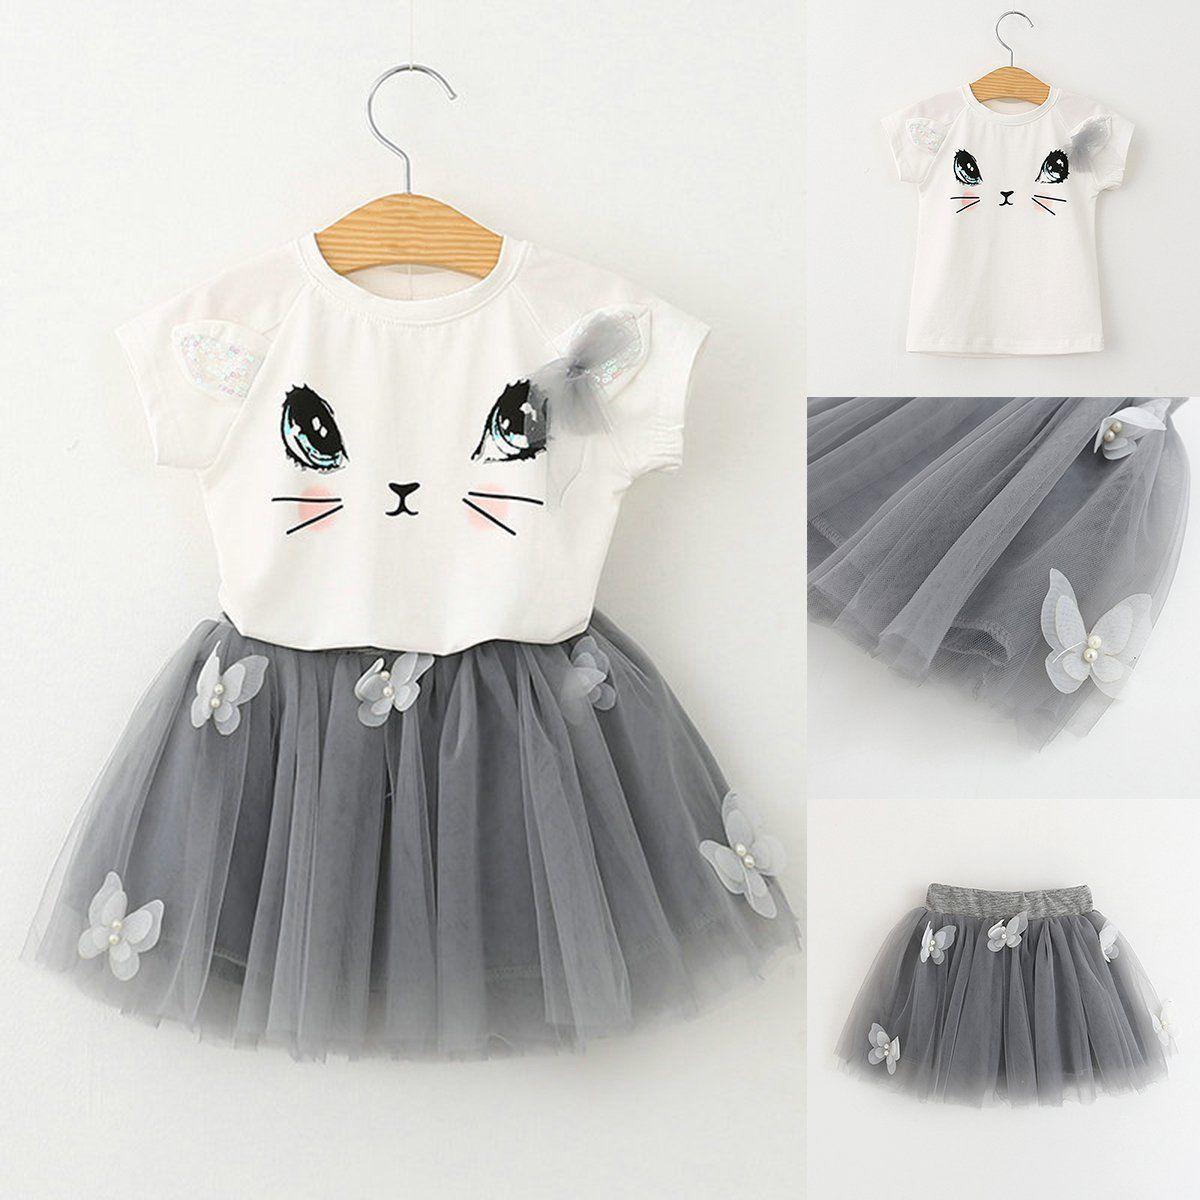 0ac487877 2Pcs Toddler Kids Baby Girls Outfits Clothes T-Shirt Tops+Tutu Short Skirt  Sets